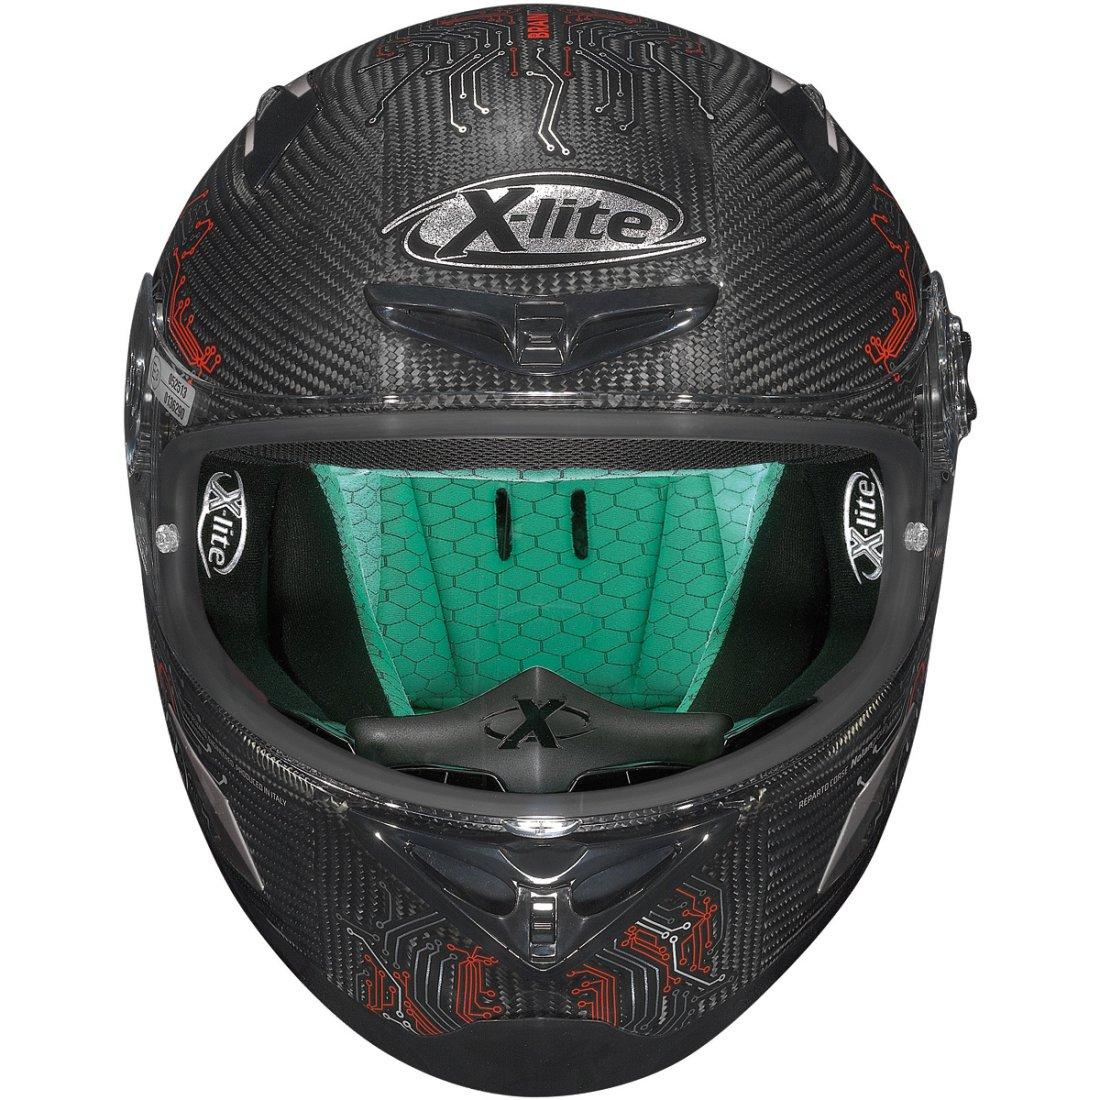 x lite x 802rr ultra carbon btc carbon helmet motocard. Black Bedroom Furniture Sets. Home Design Ideas